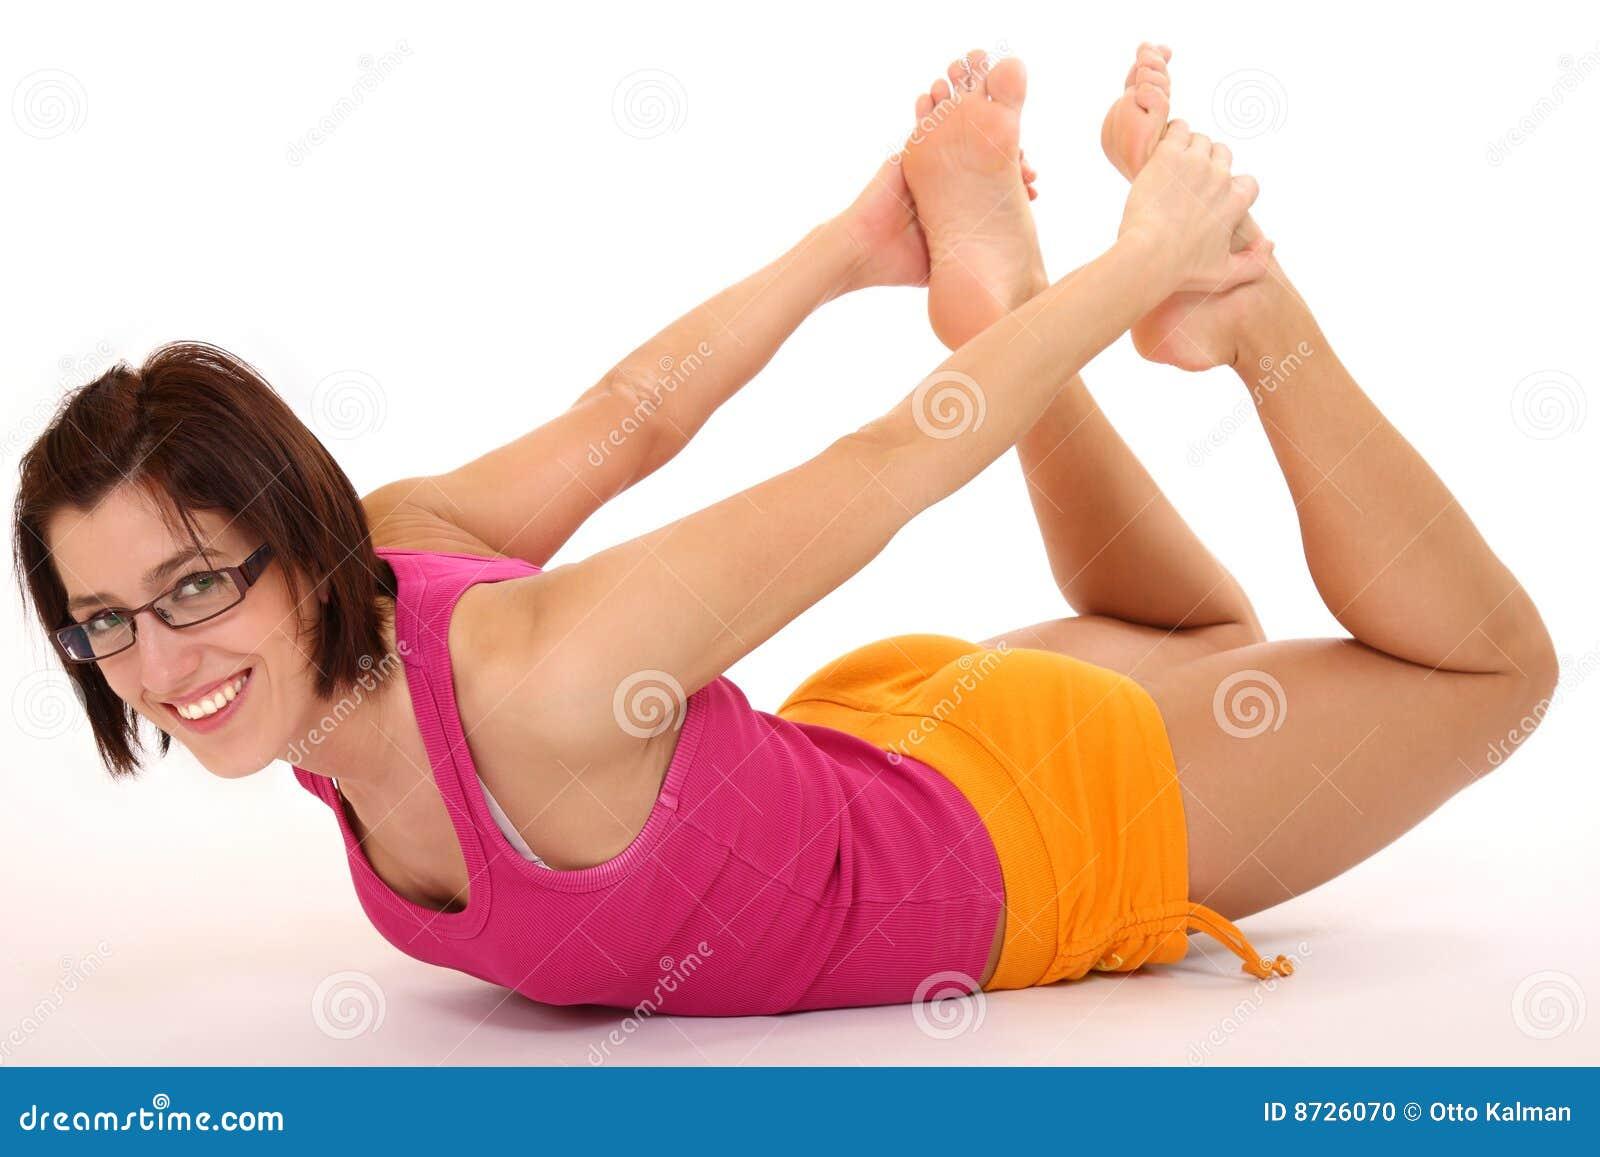 young woman doing yoga pose mr yes pr no 2 349 2